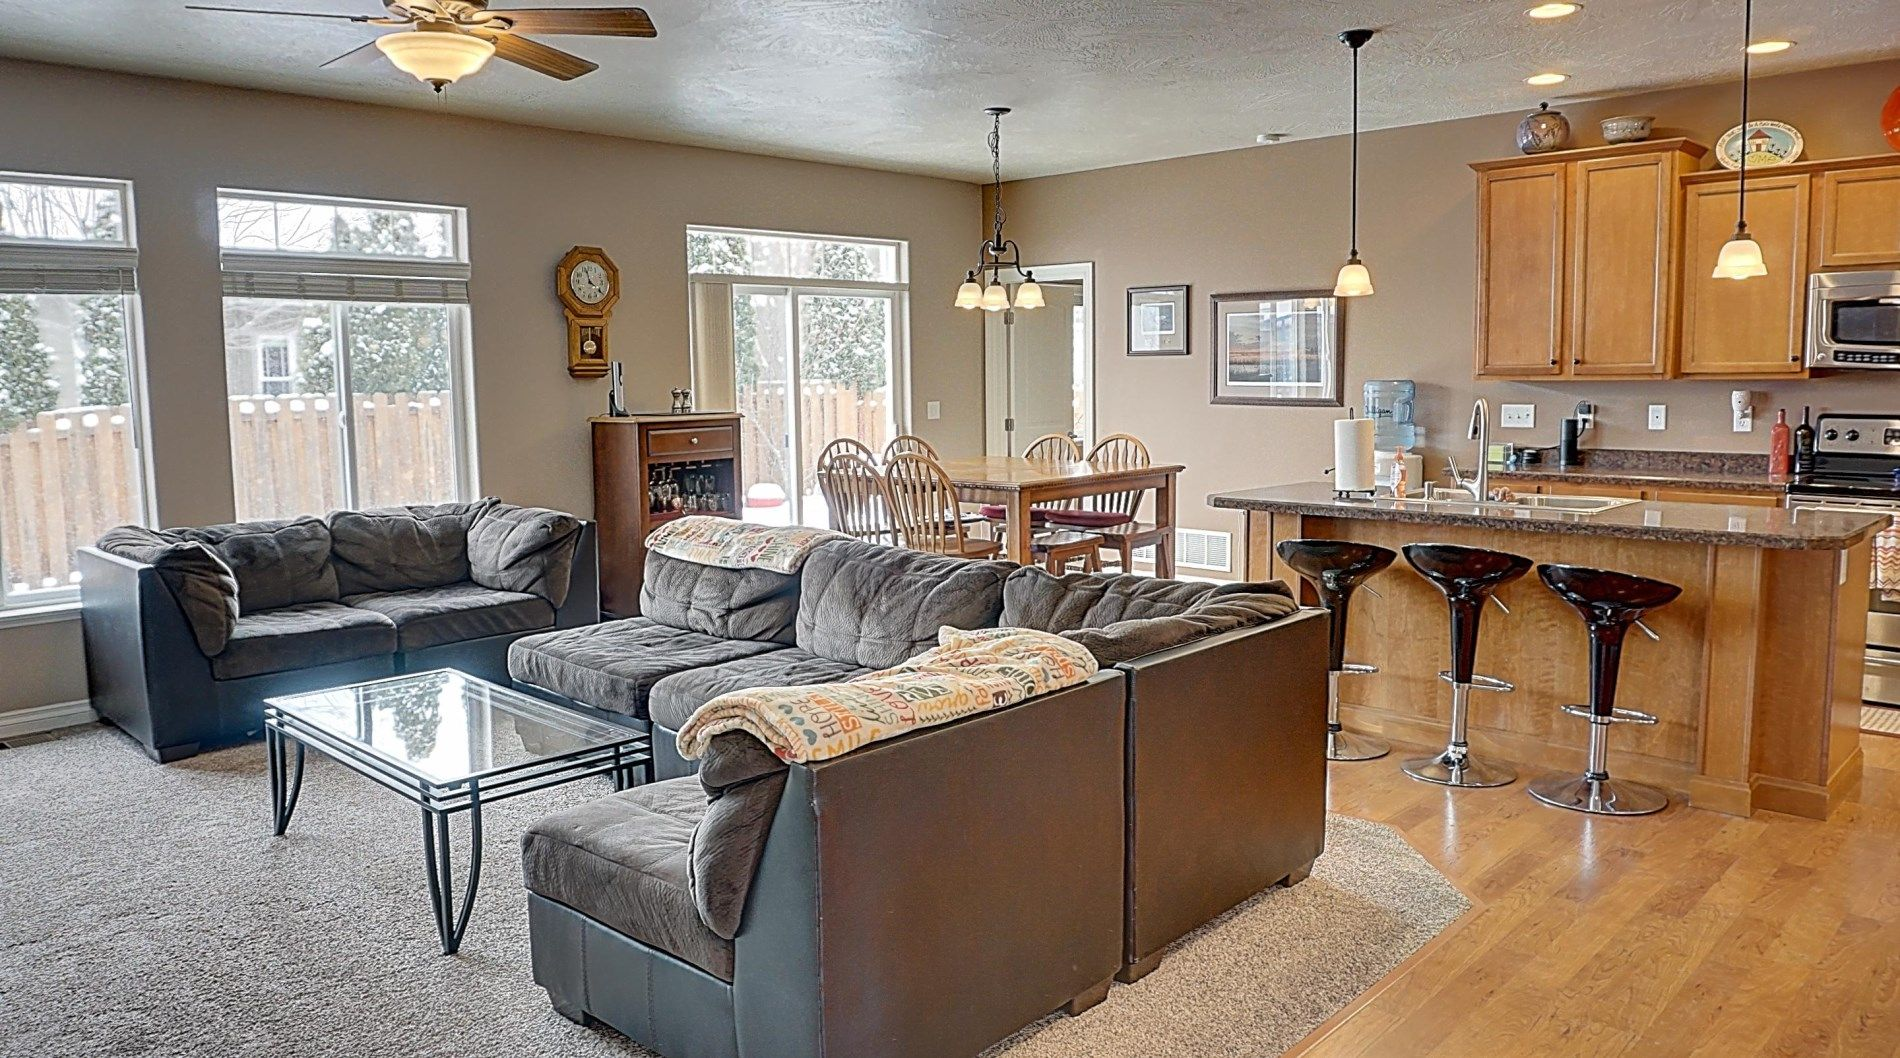 6104 Hobson Ln, Missoula, MT 59803 - 5 Bed, 3 Bath Single-Family Home - MLS  #21902112 - 38 Photos | Trulia